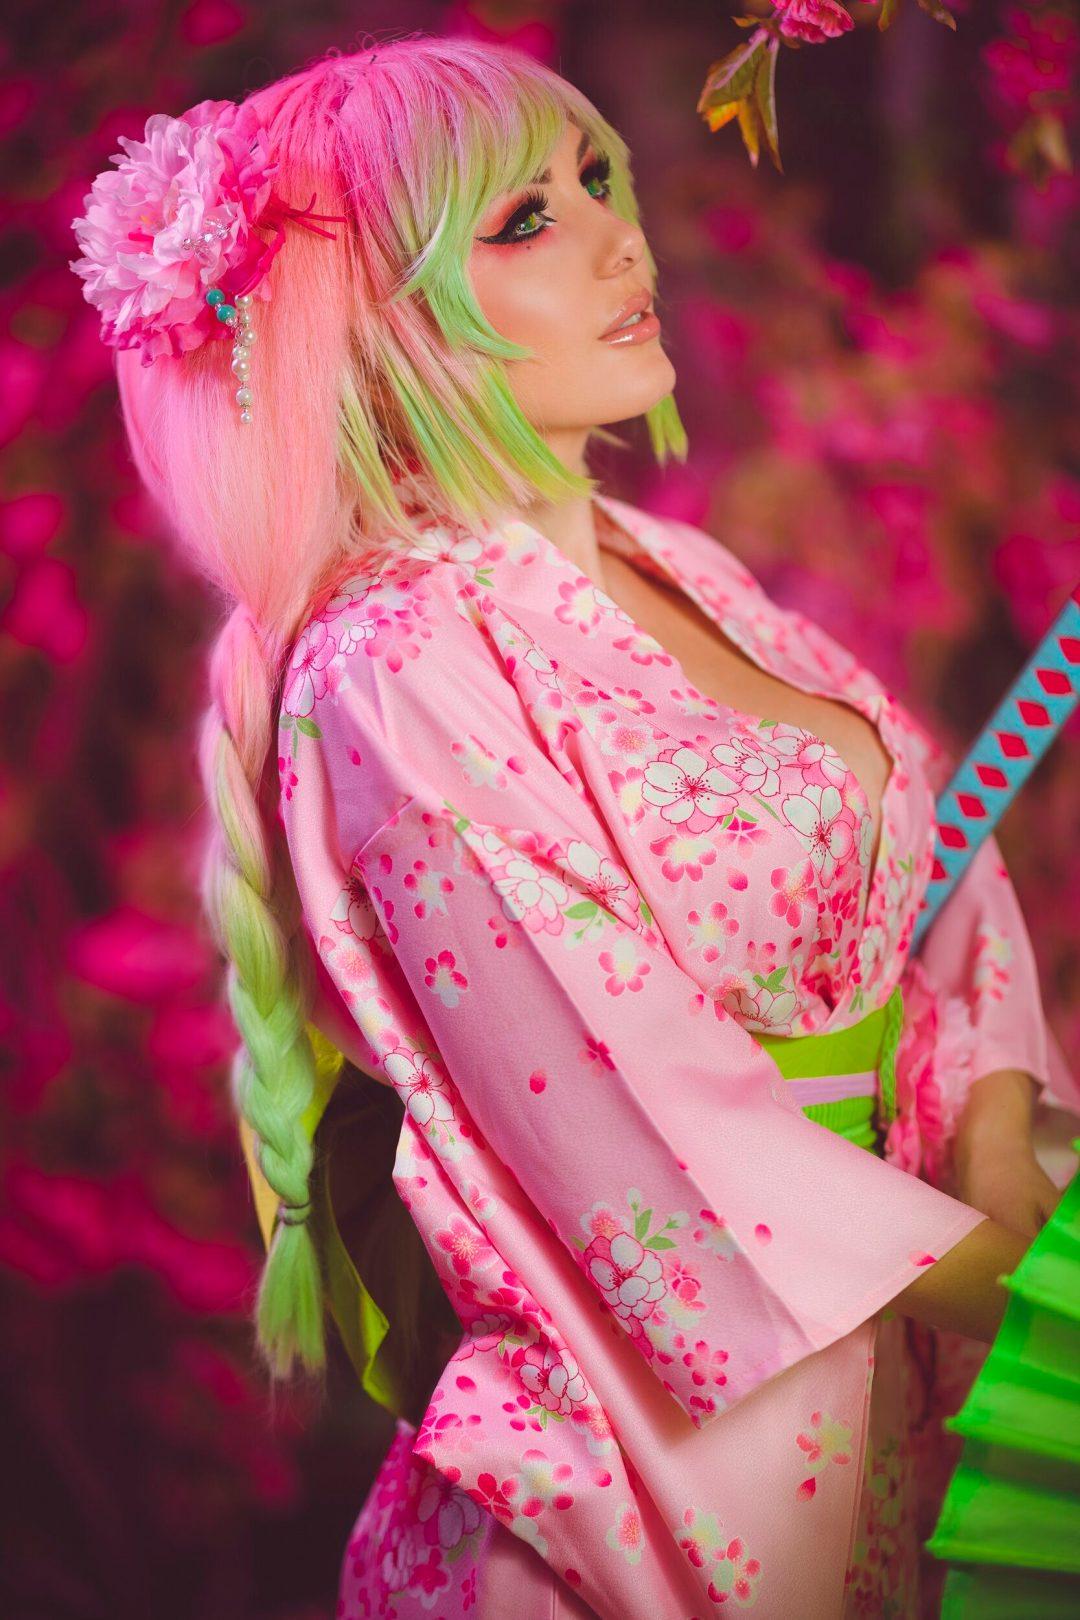 Jessica Nigri Mitsuri Private Patreon HD Images - GeekShizzle